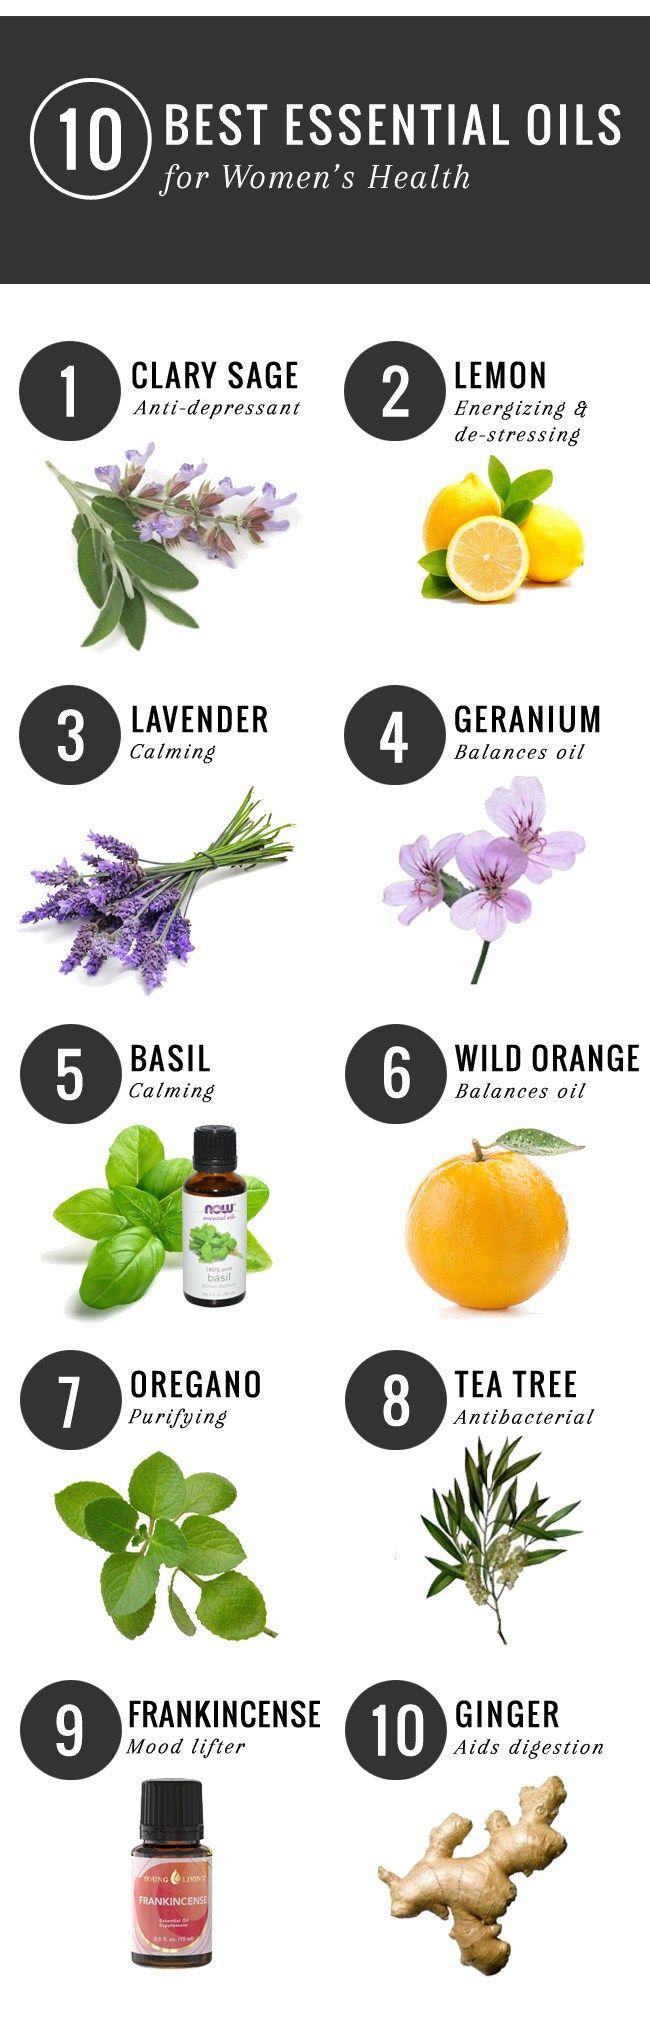 10 Best Essential Oils for Women's Health | HelloGlow.co